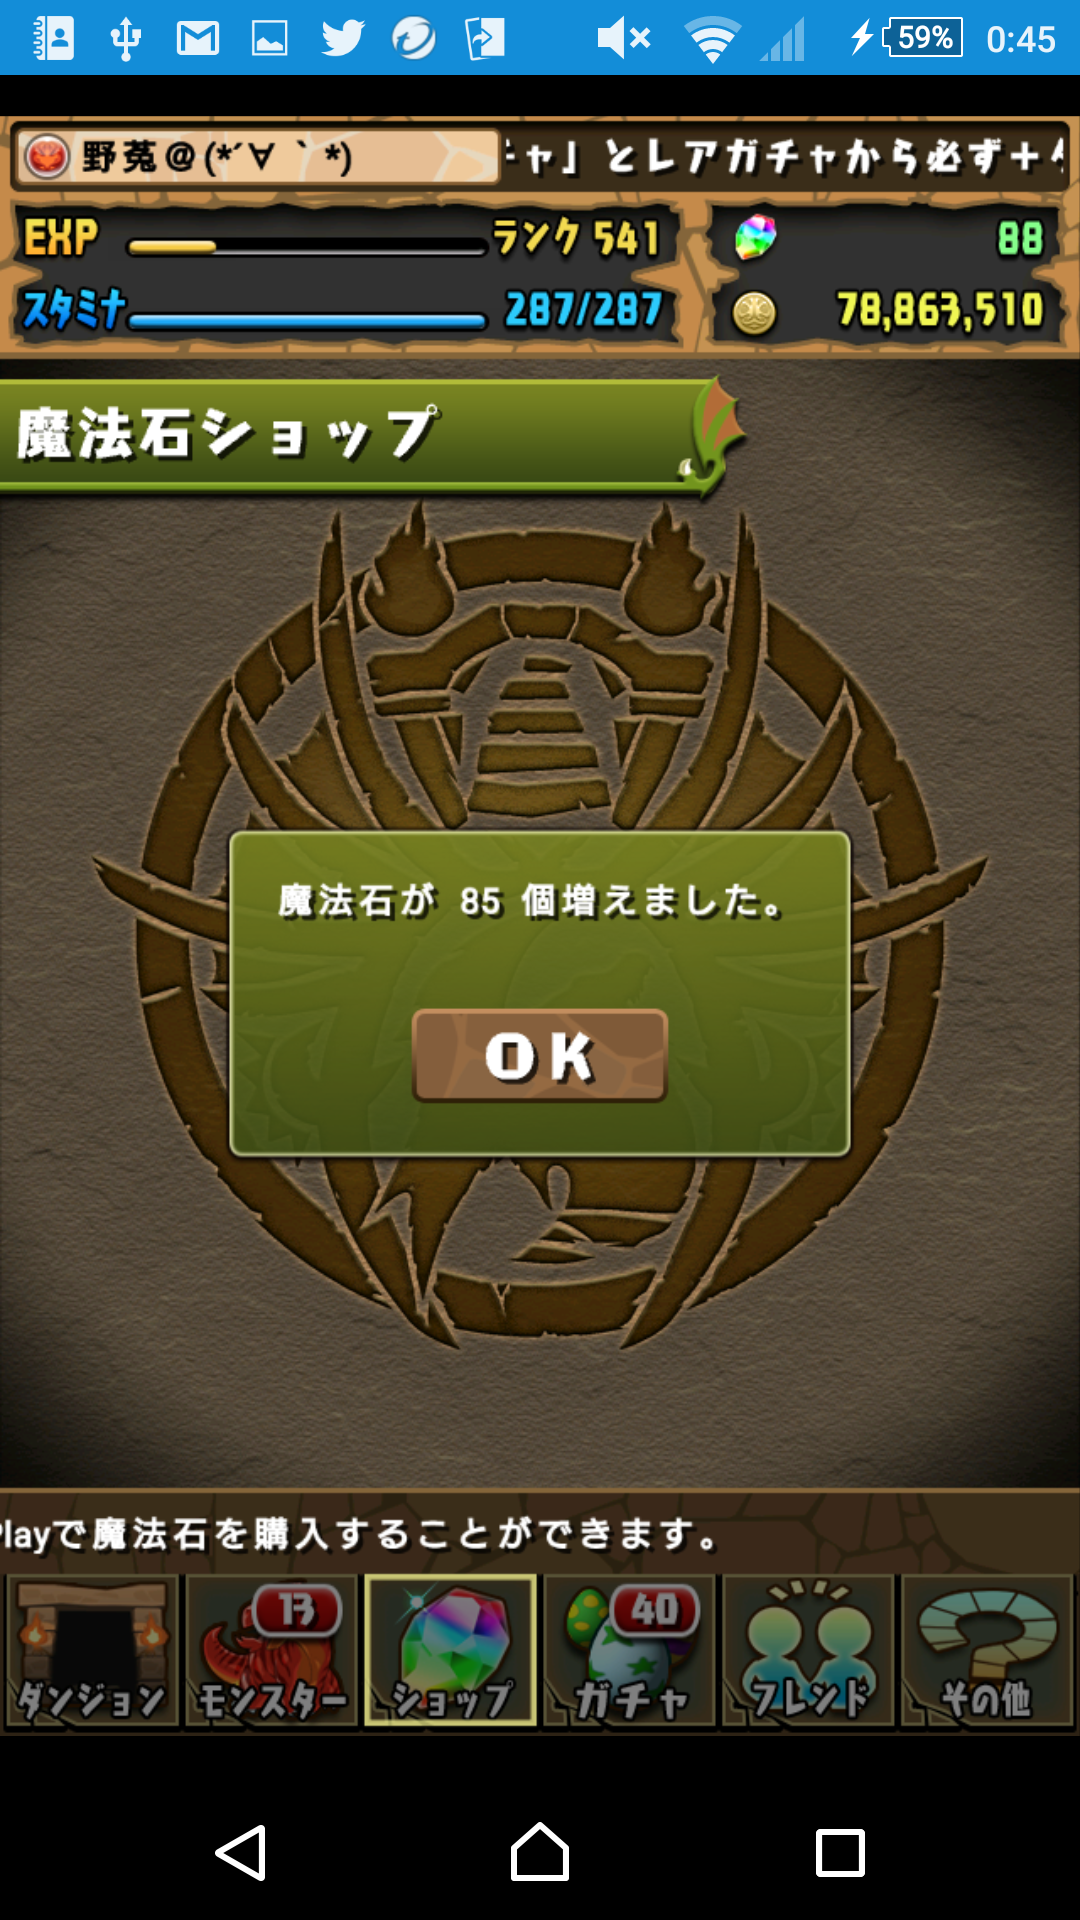 Screenshot_2015-12-24-00-45-53.png